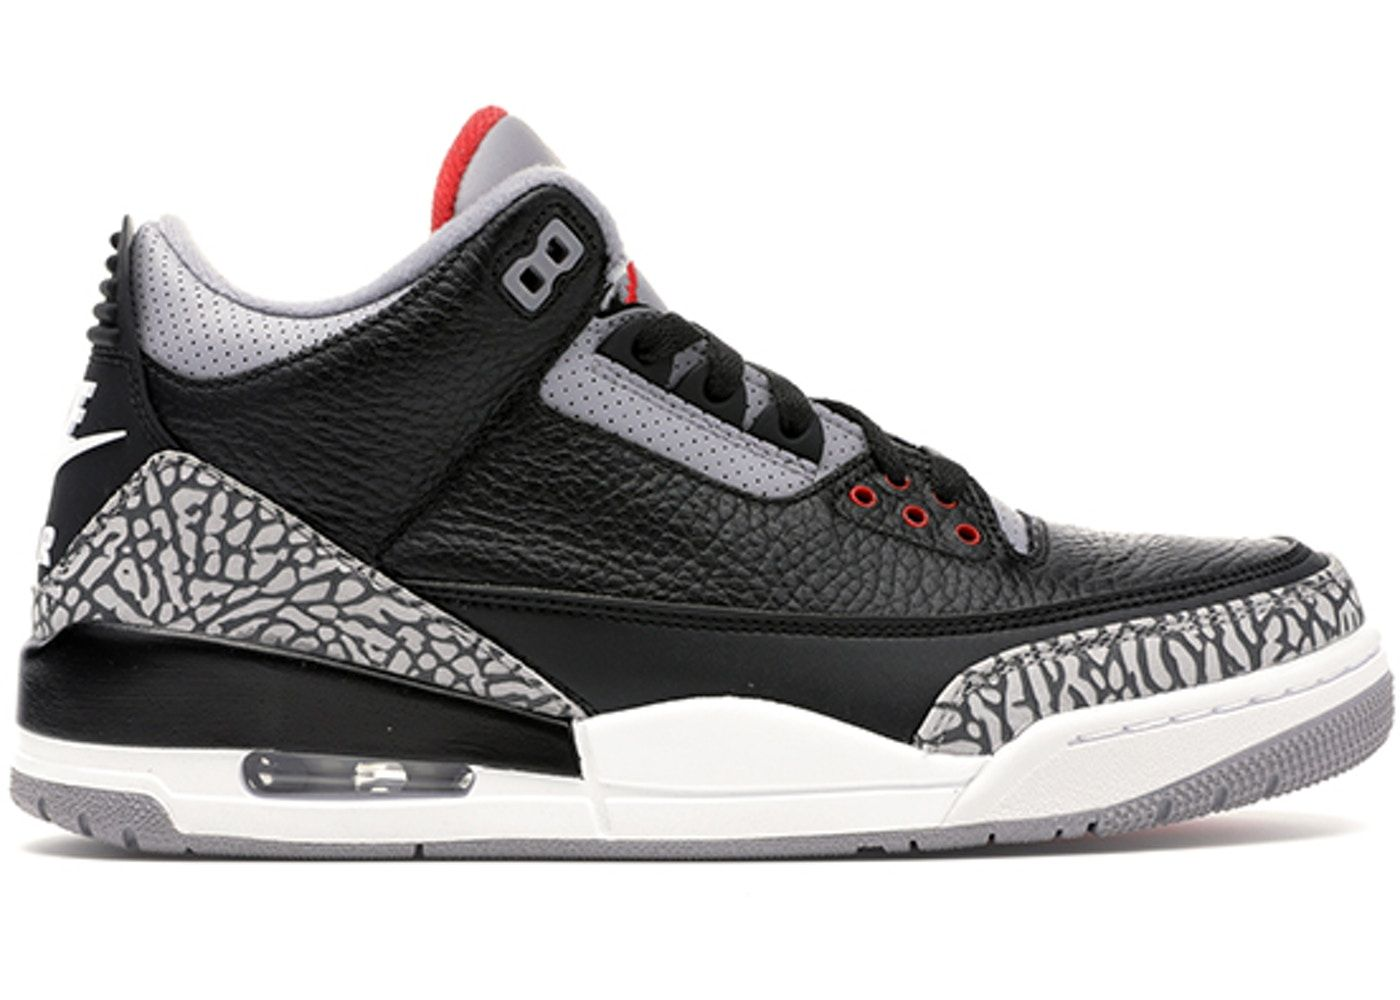 Jordan 3 Retro Black Cement 2018 Jordan Shoes Retro Air Jordans Jordan 3 Black Cement